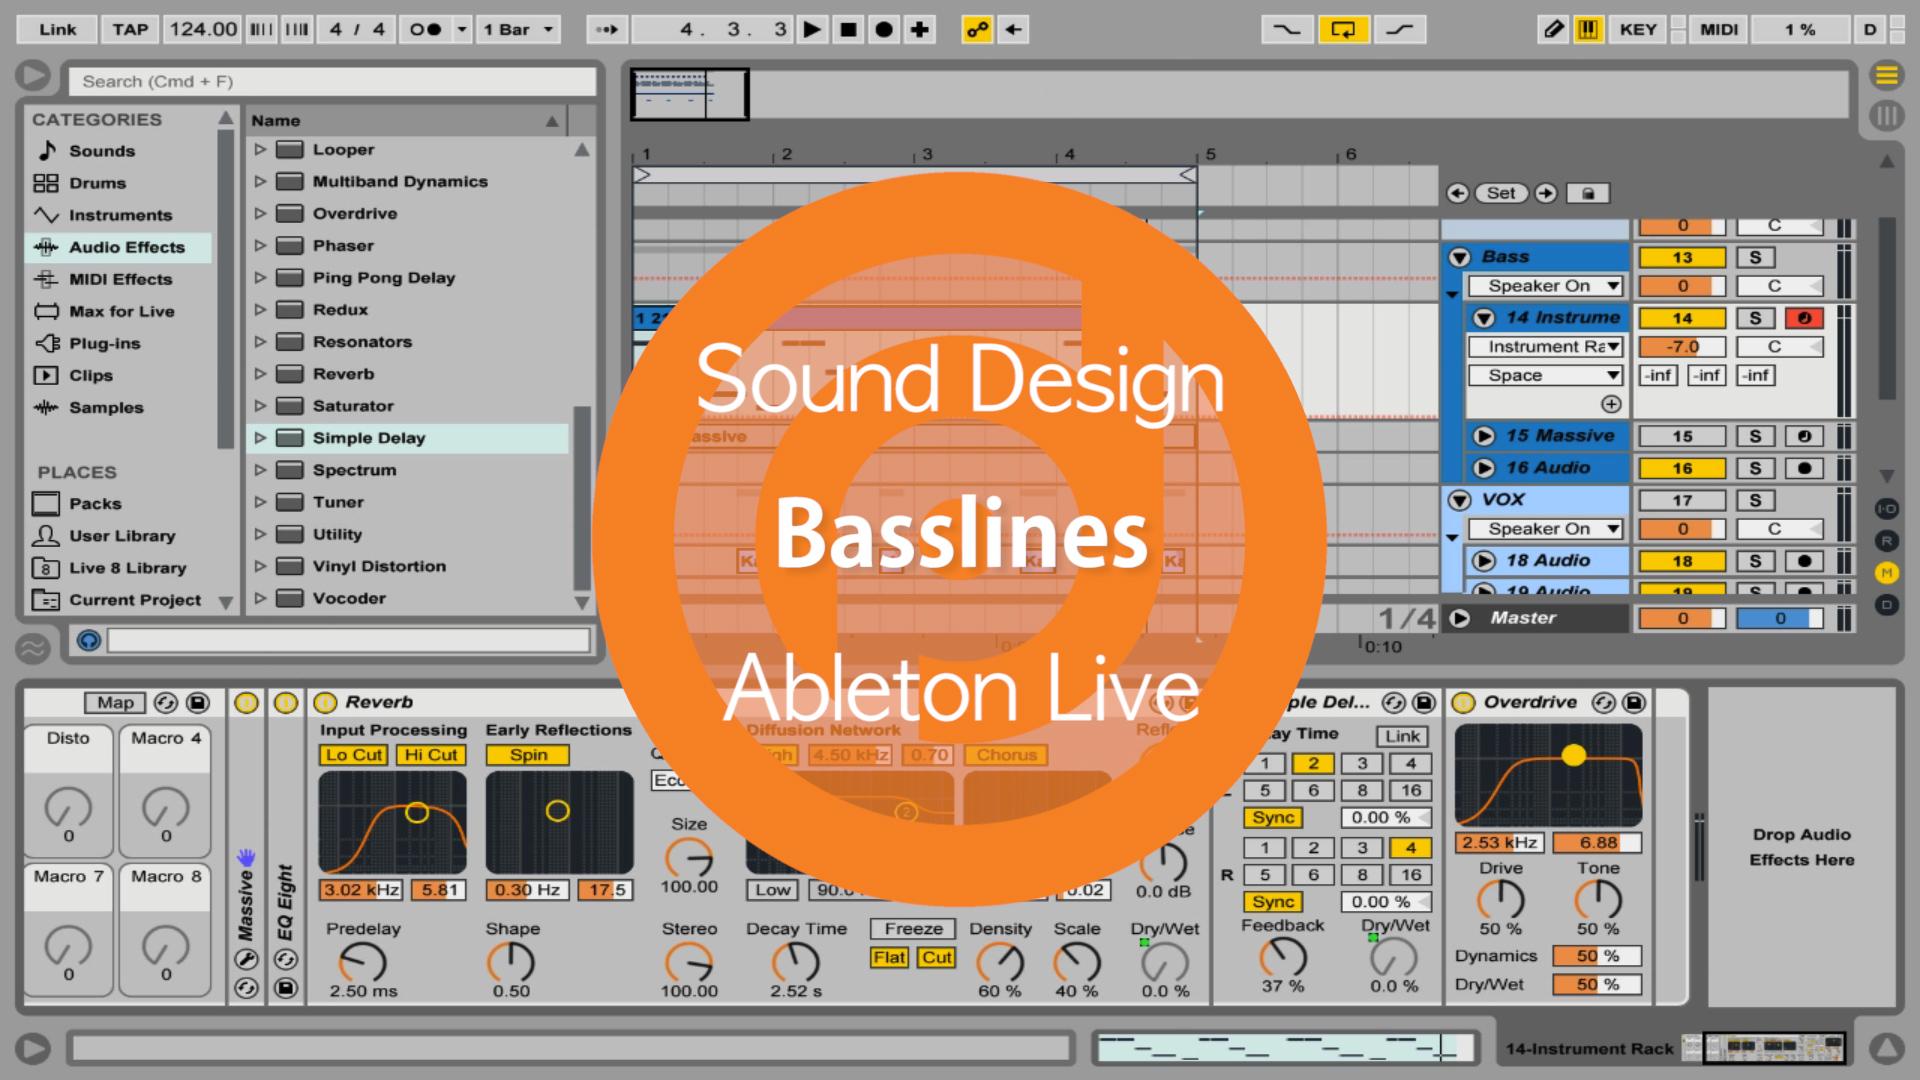 Basslines Ableton Live